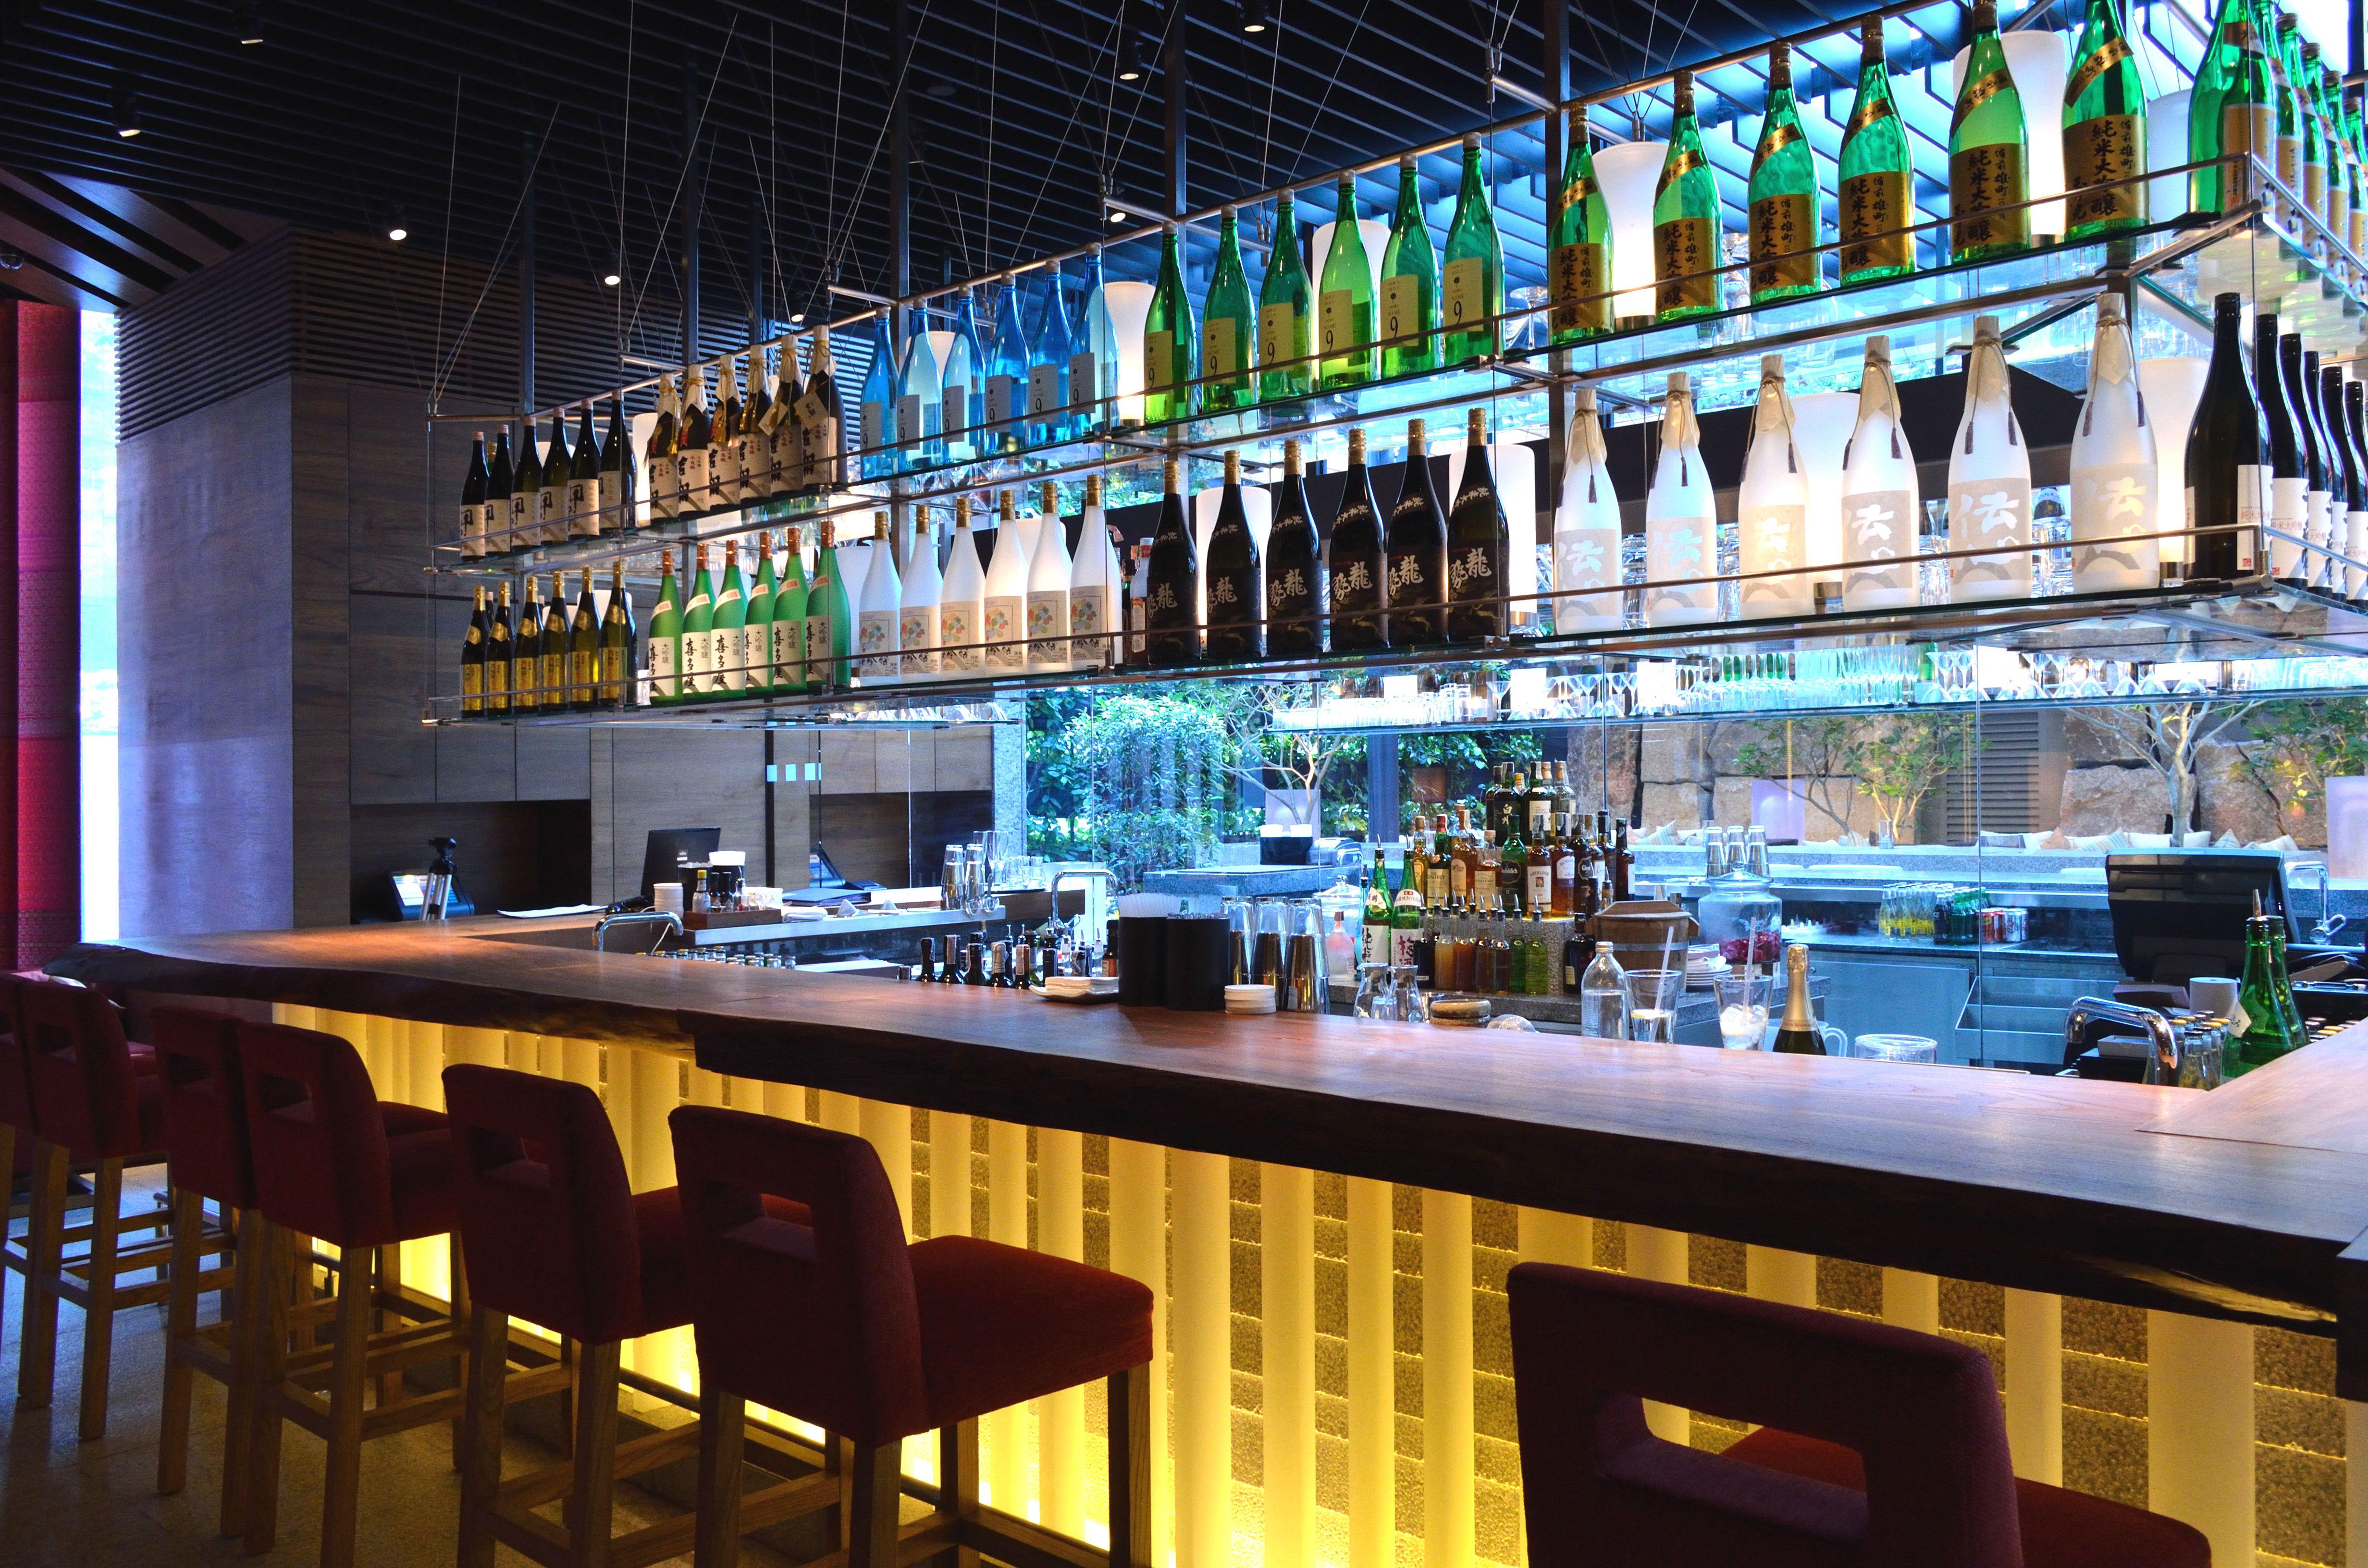 ZUMA Bangkok located in the spectacular St Regis Hotel